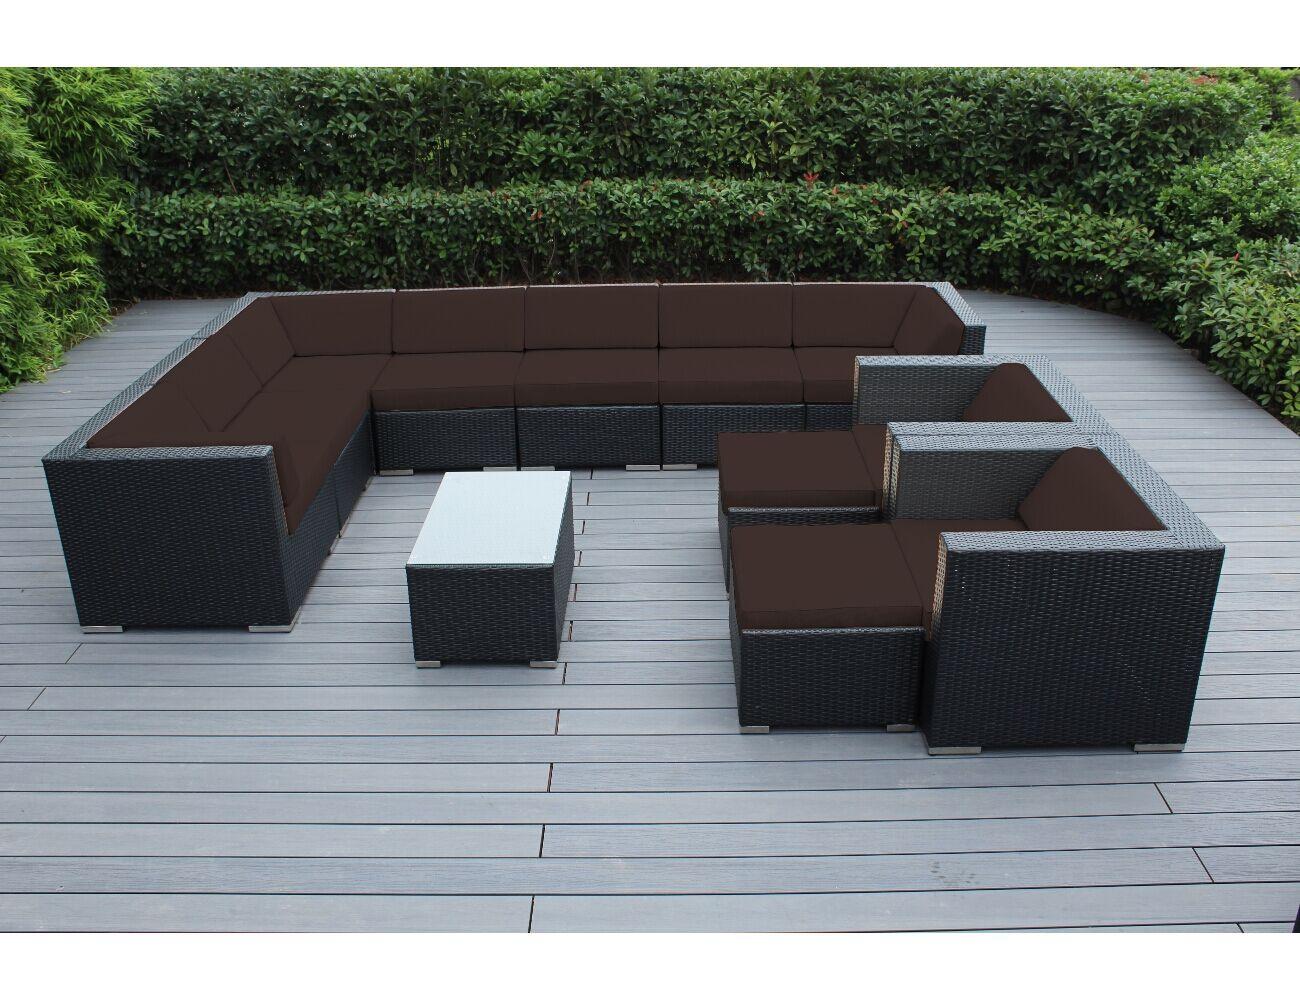 Konieczny 12 Piece Rattan Sunbrella Sectional Set with Cushions Frame Finish: Black, Cushion Color: Aruba